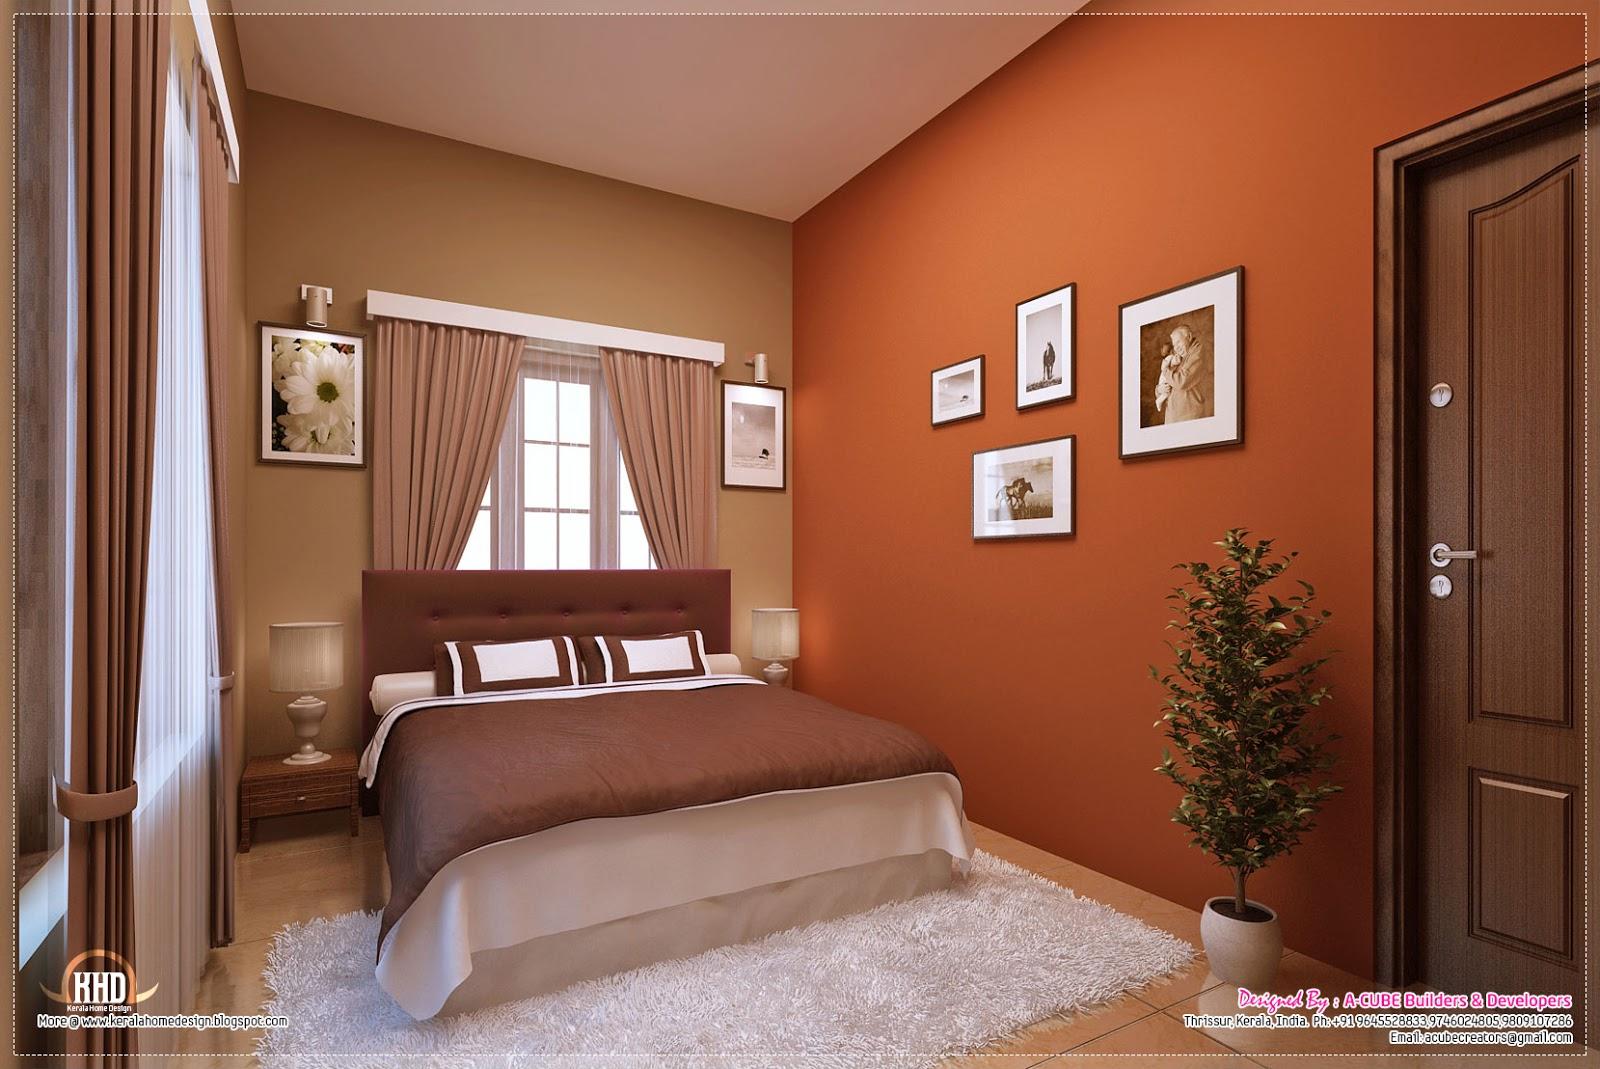 new home design ideas kerala pleasing home interior design ideas on kerala home interior design bedroom